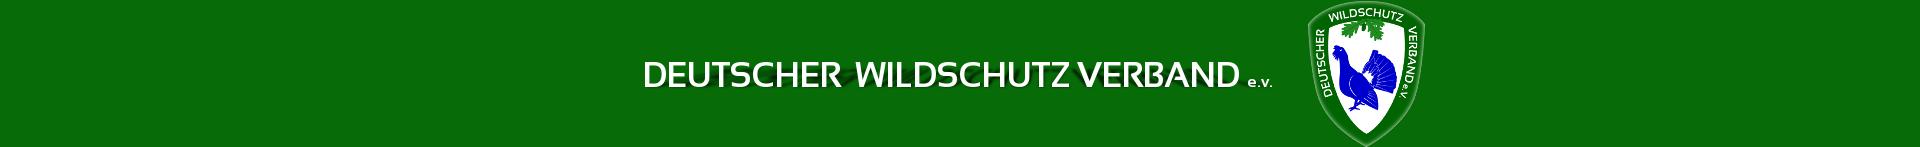 DWV Logo